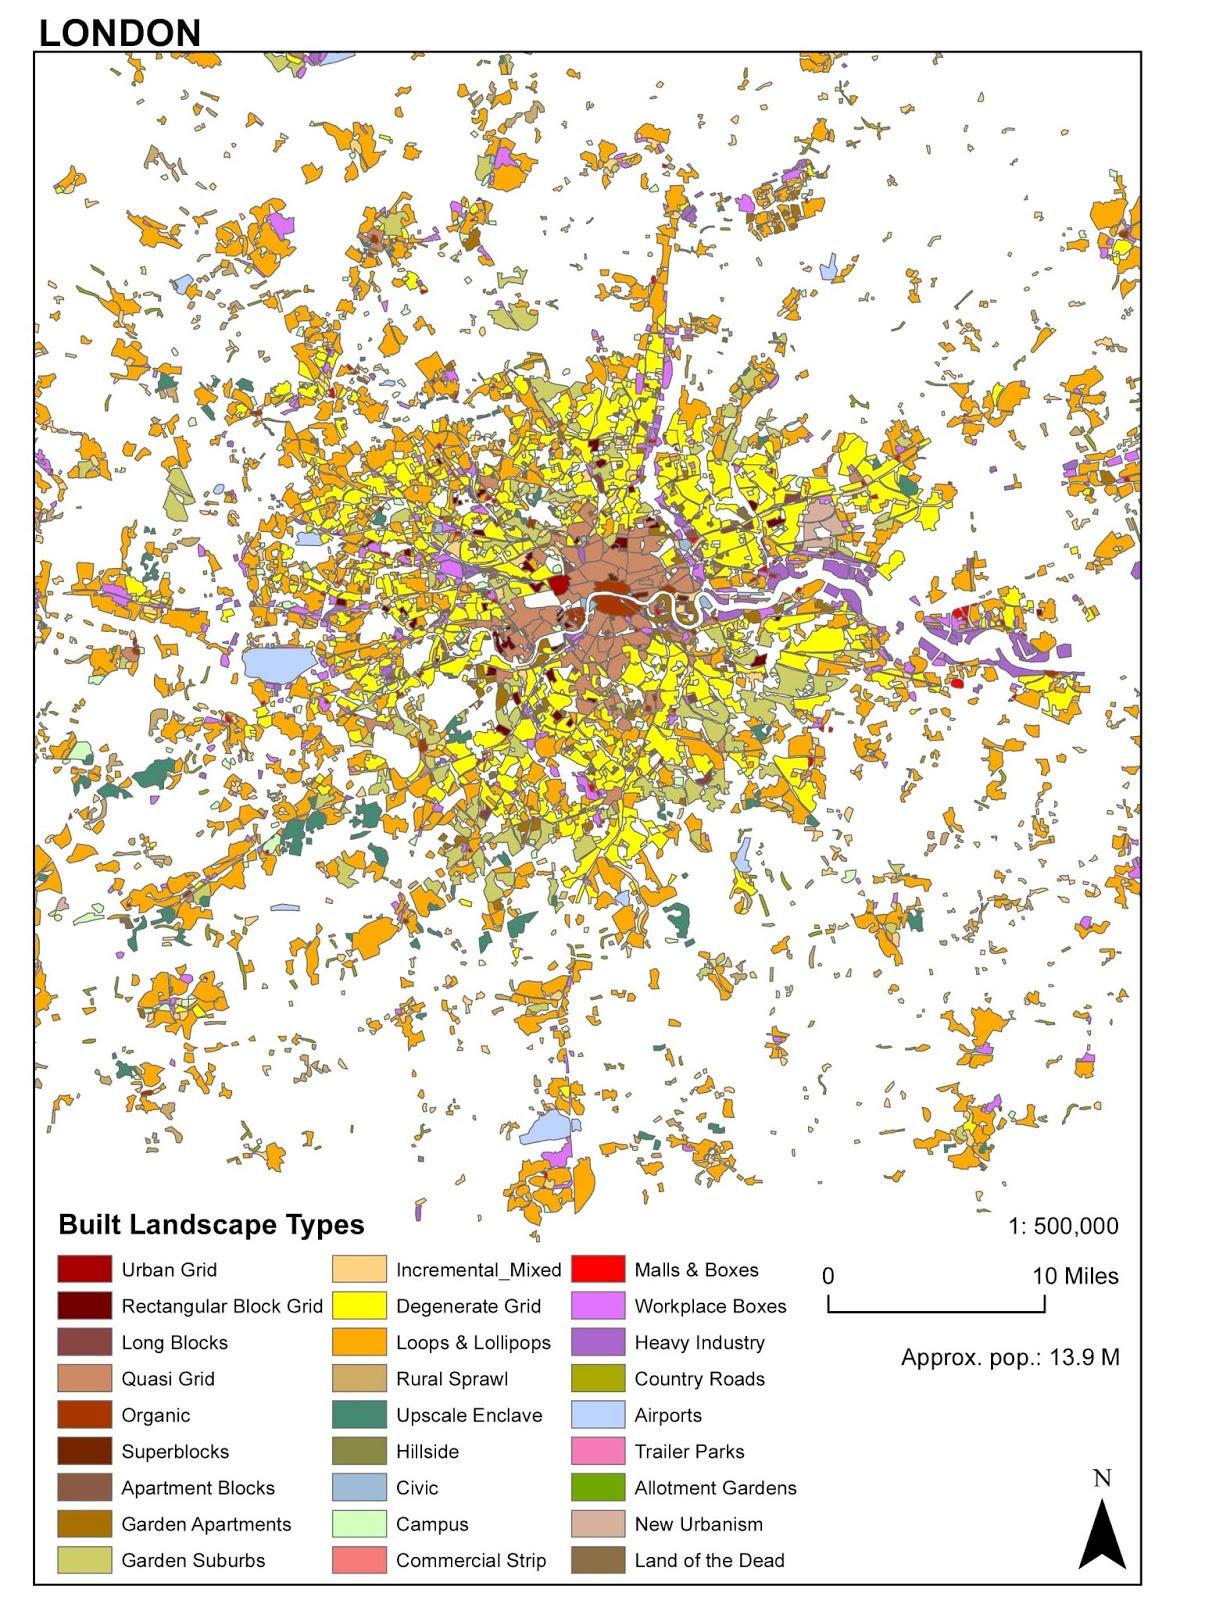 Built Landscapes of Metropolitan Regions (London)